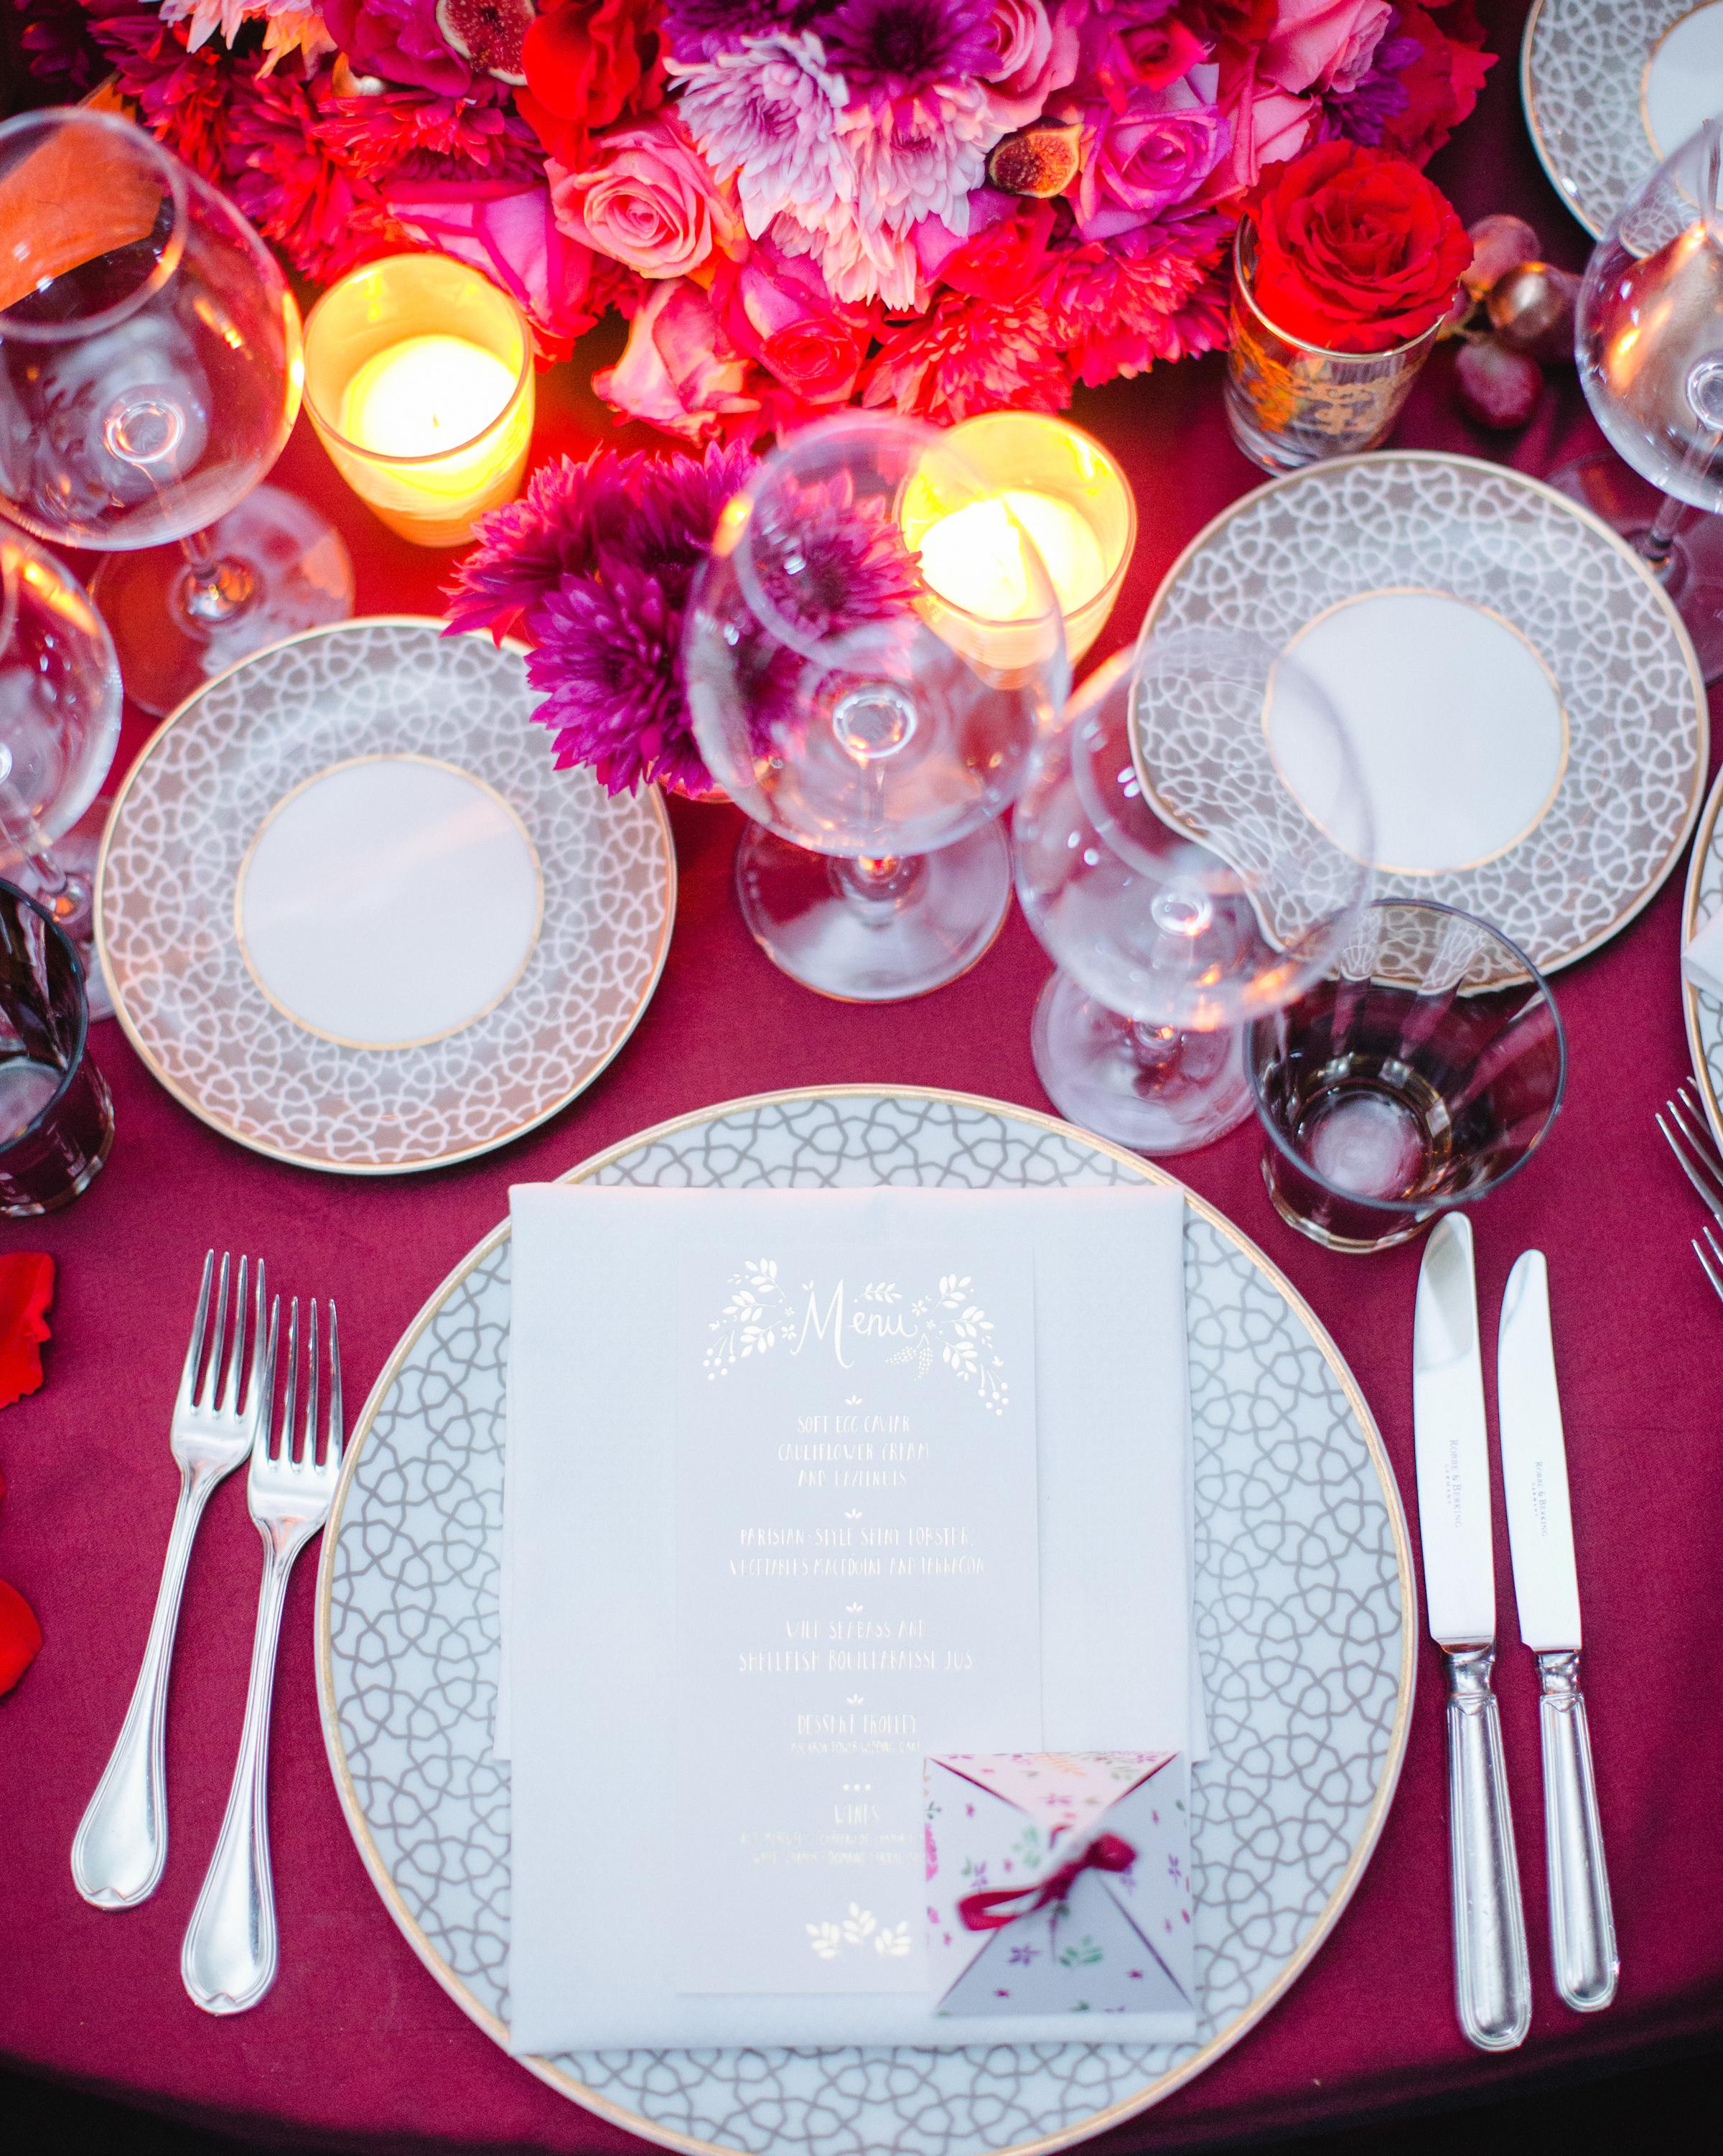 federica-tommaso-wedding-placesetting-090-s112330-1015.jpg